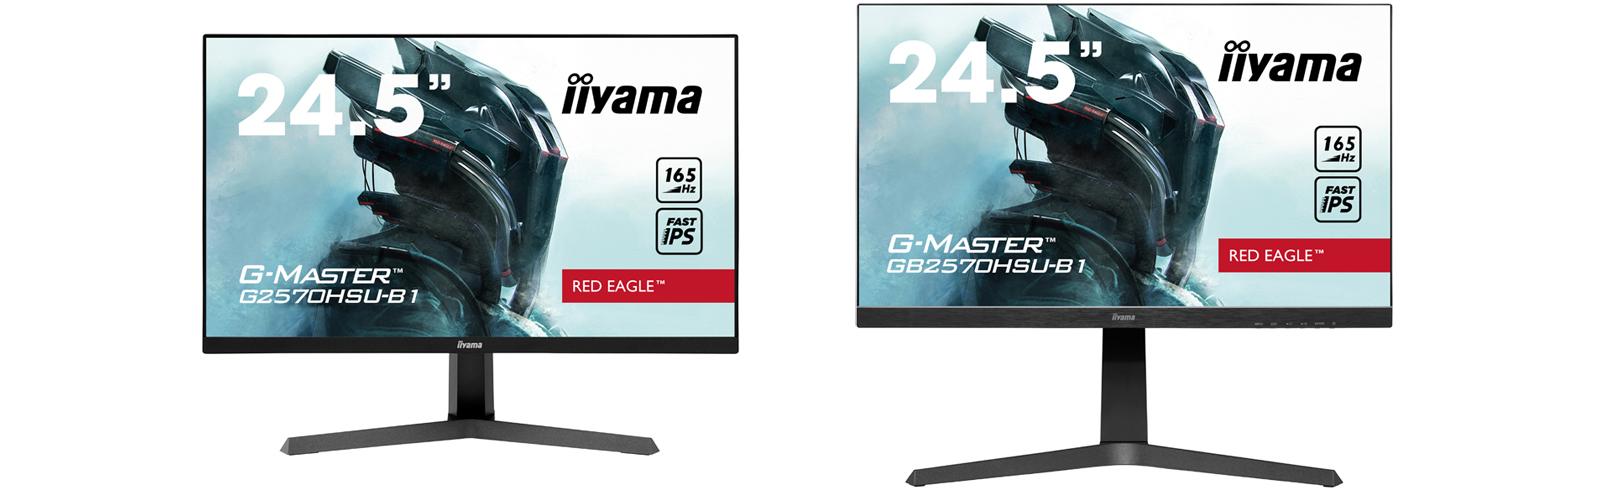 iiyama G-Master GB2570QSU-B1 and G2570QSU-B1 go official with FHD Fat IPS display, 165Hz refresh rate